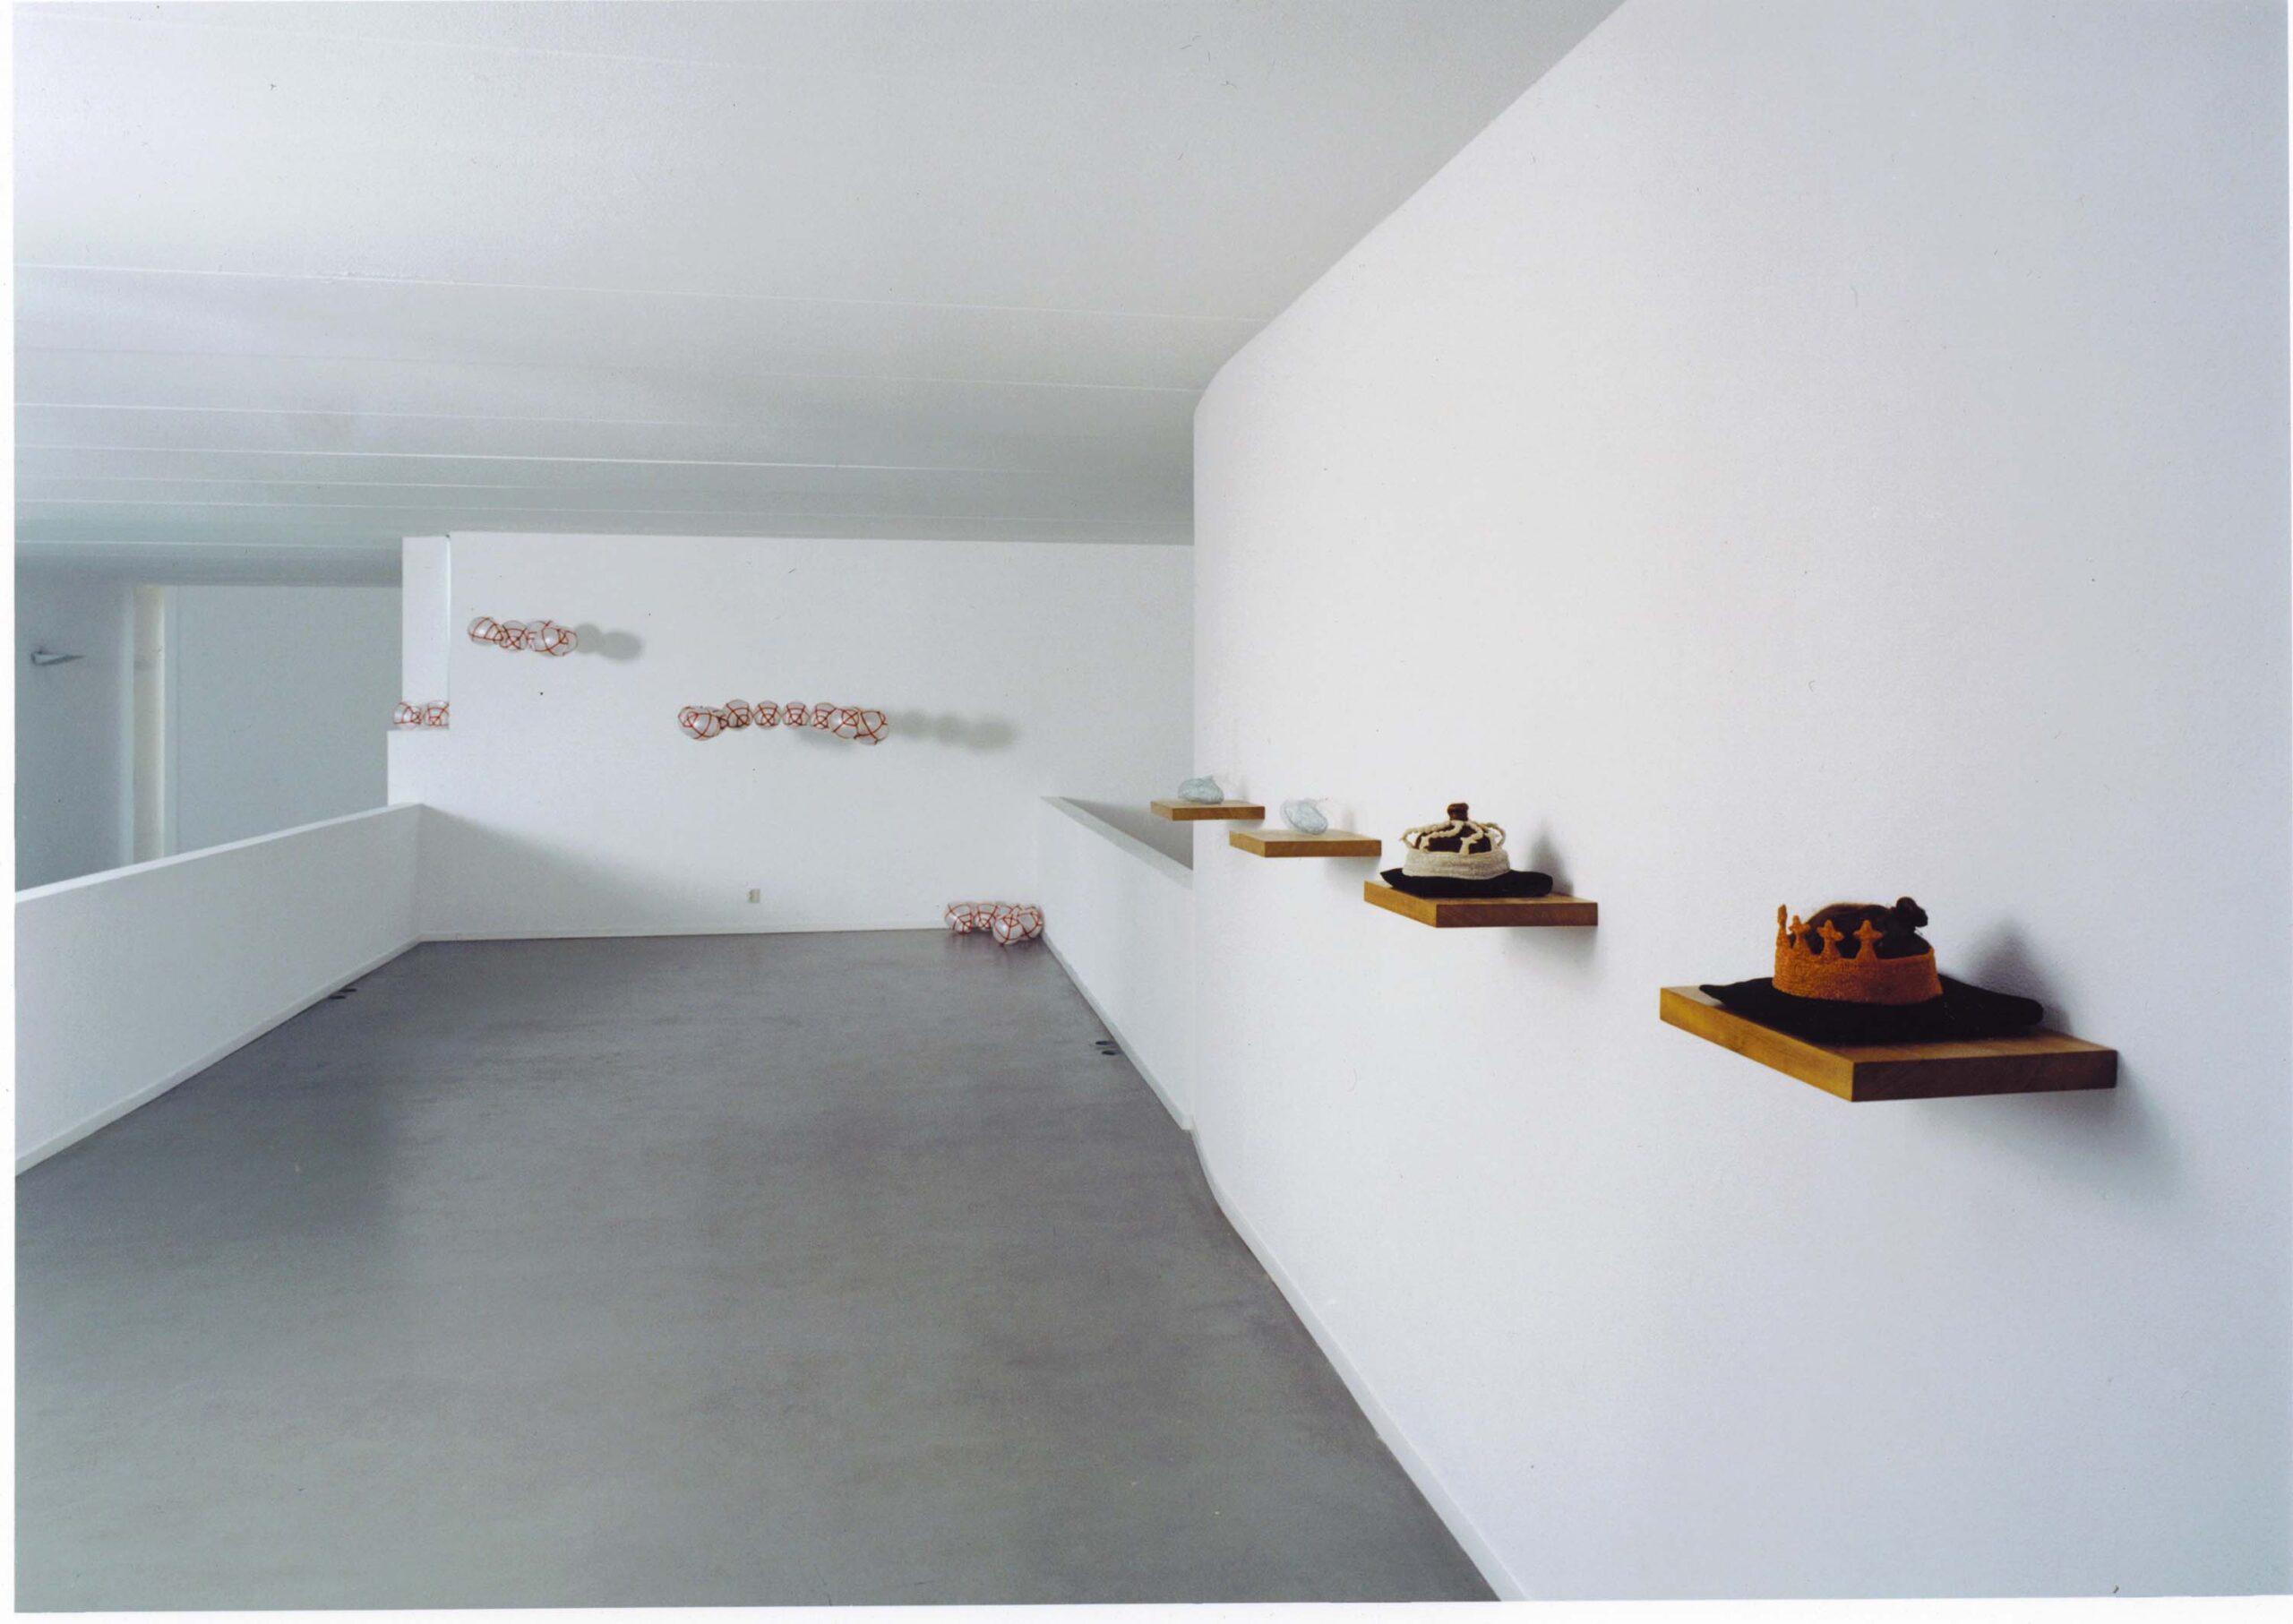 Solo Exhibition Diepenheim 2002<div style='clear:both;width:100%;height:0px;'></div><span class='desc'>Kunstvereniging Diepenheim  <br> Theme: 5 year review <br> Photo: Claude Crommelin</span>